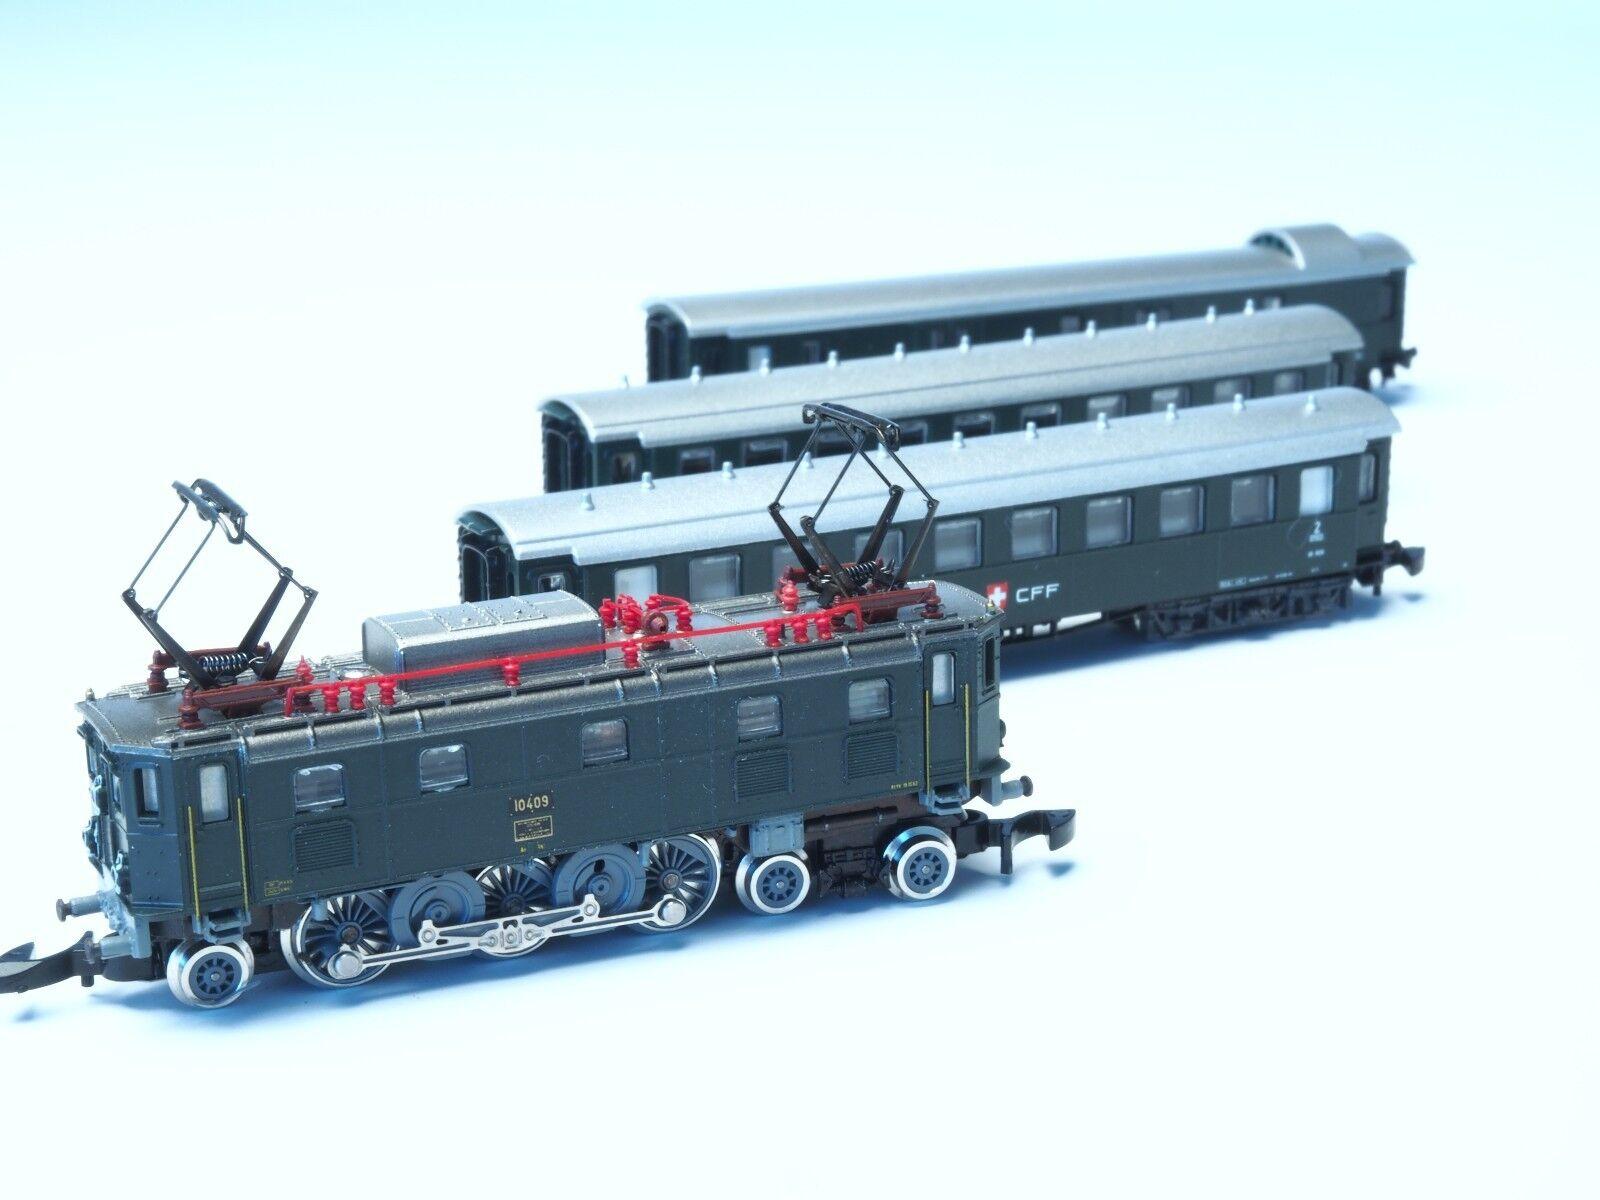 8418 Marklin Z -skala SBB Schweiz Passagerarklass Ae 3  6 II